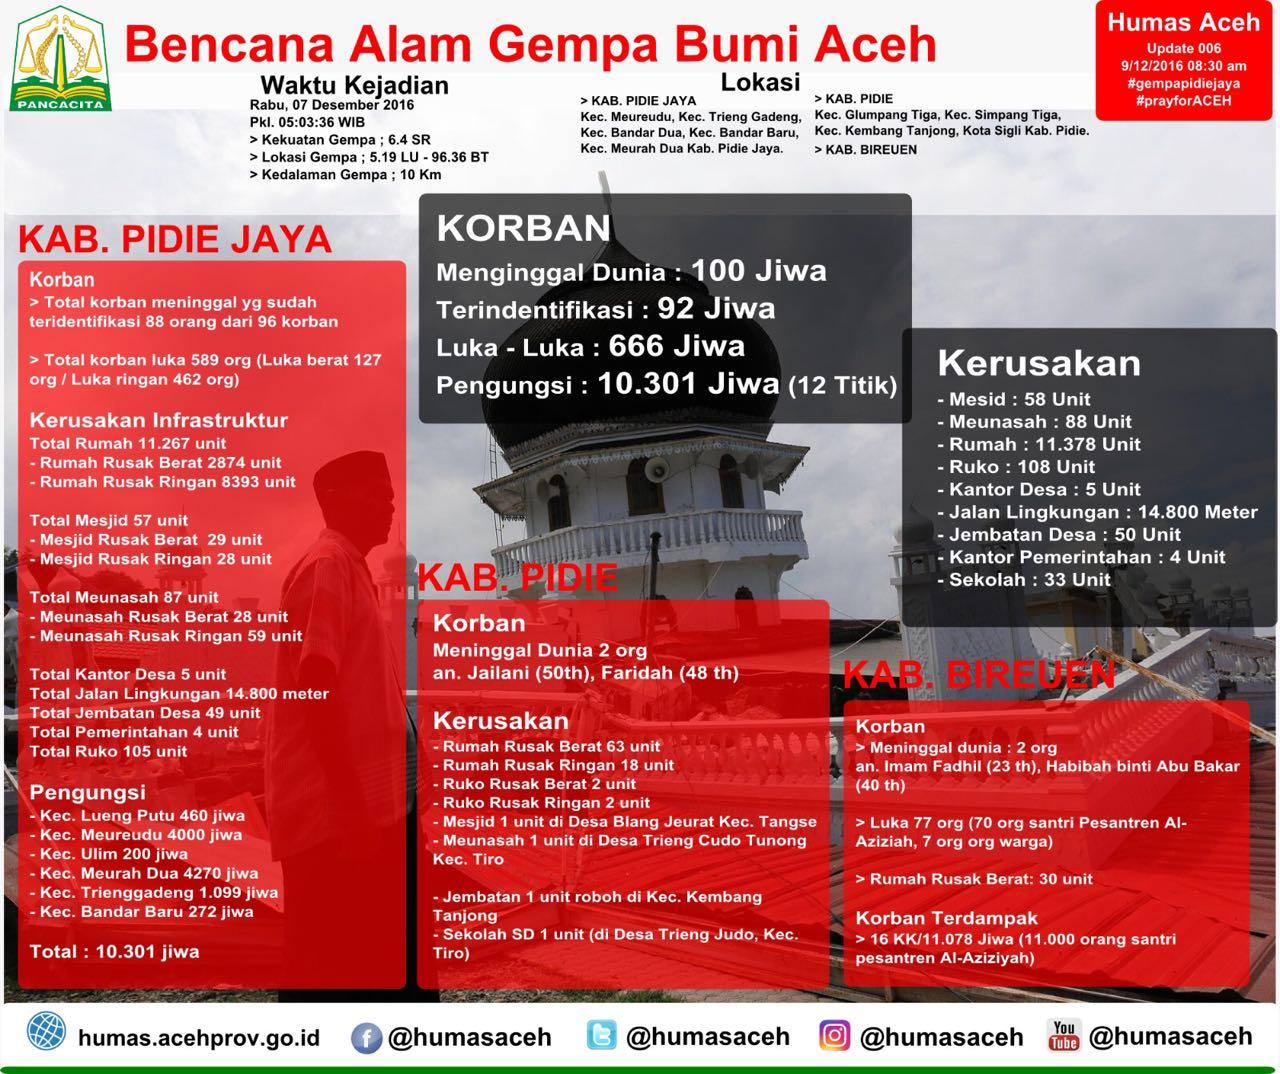 Data Humas Aceh